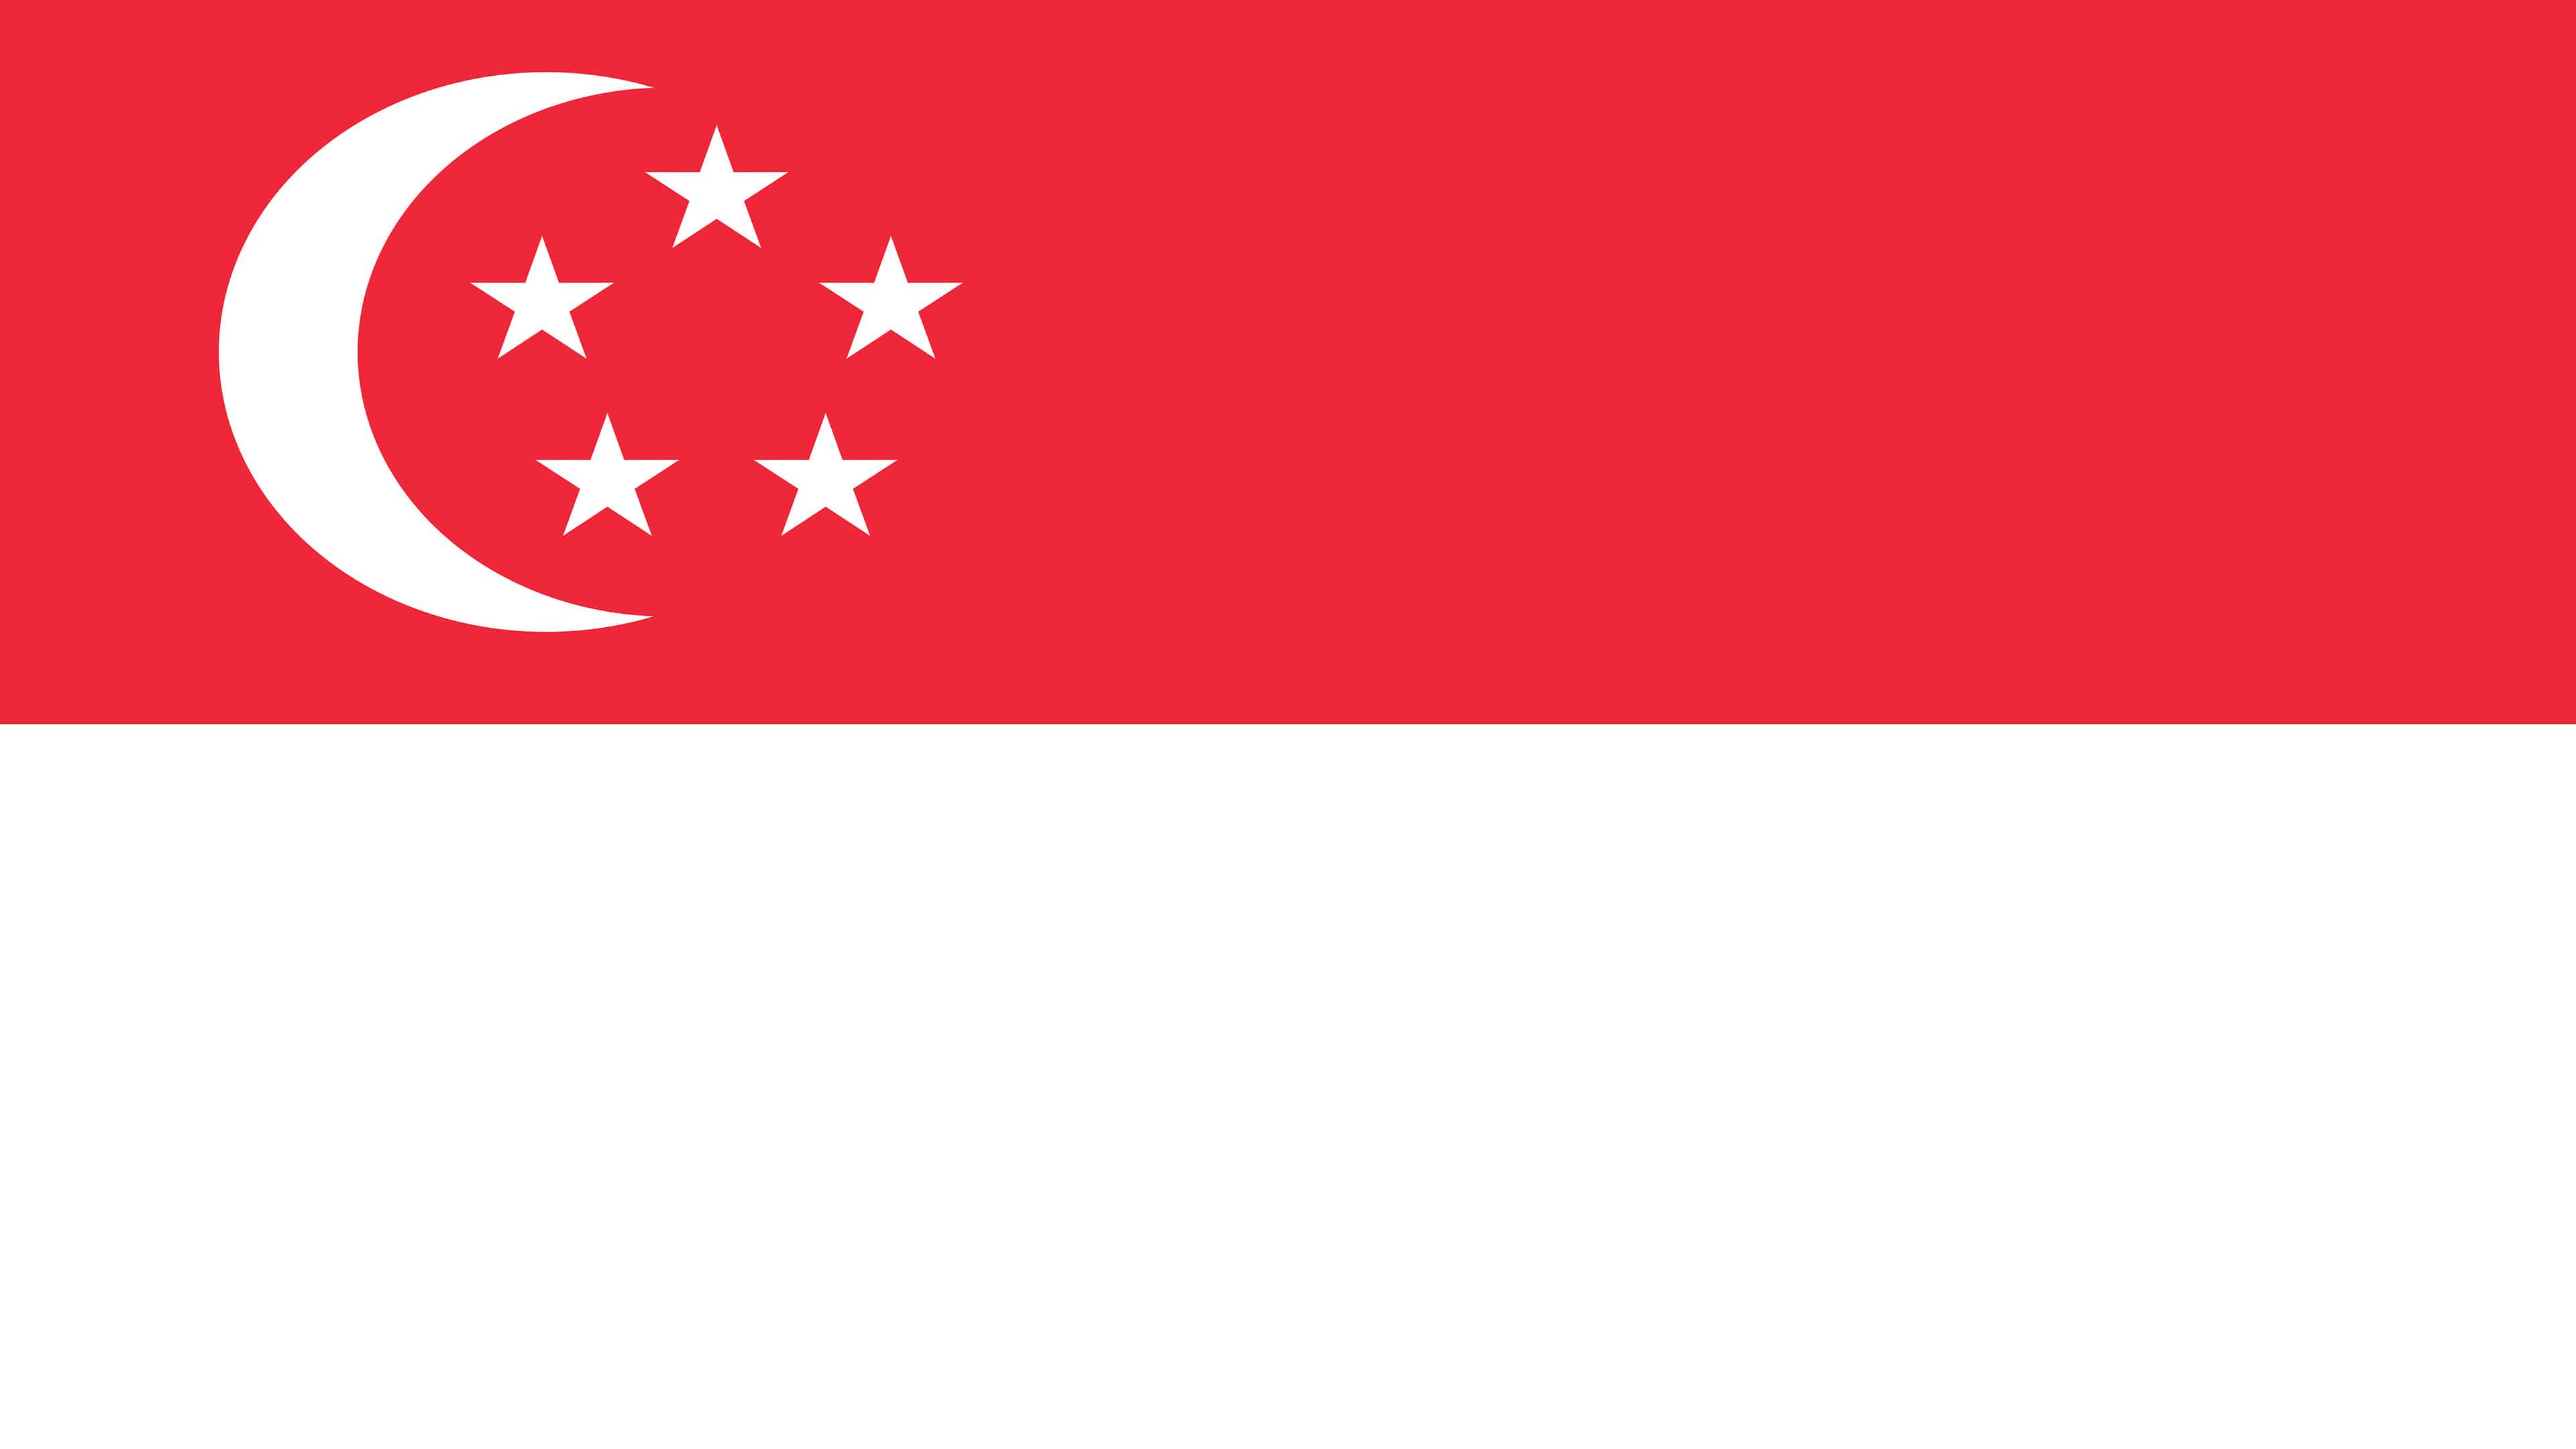 singapore flag uhd 4k wallpaper